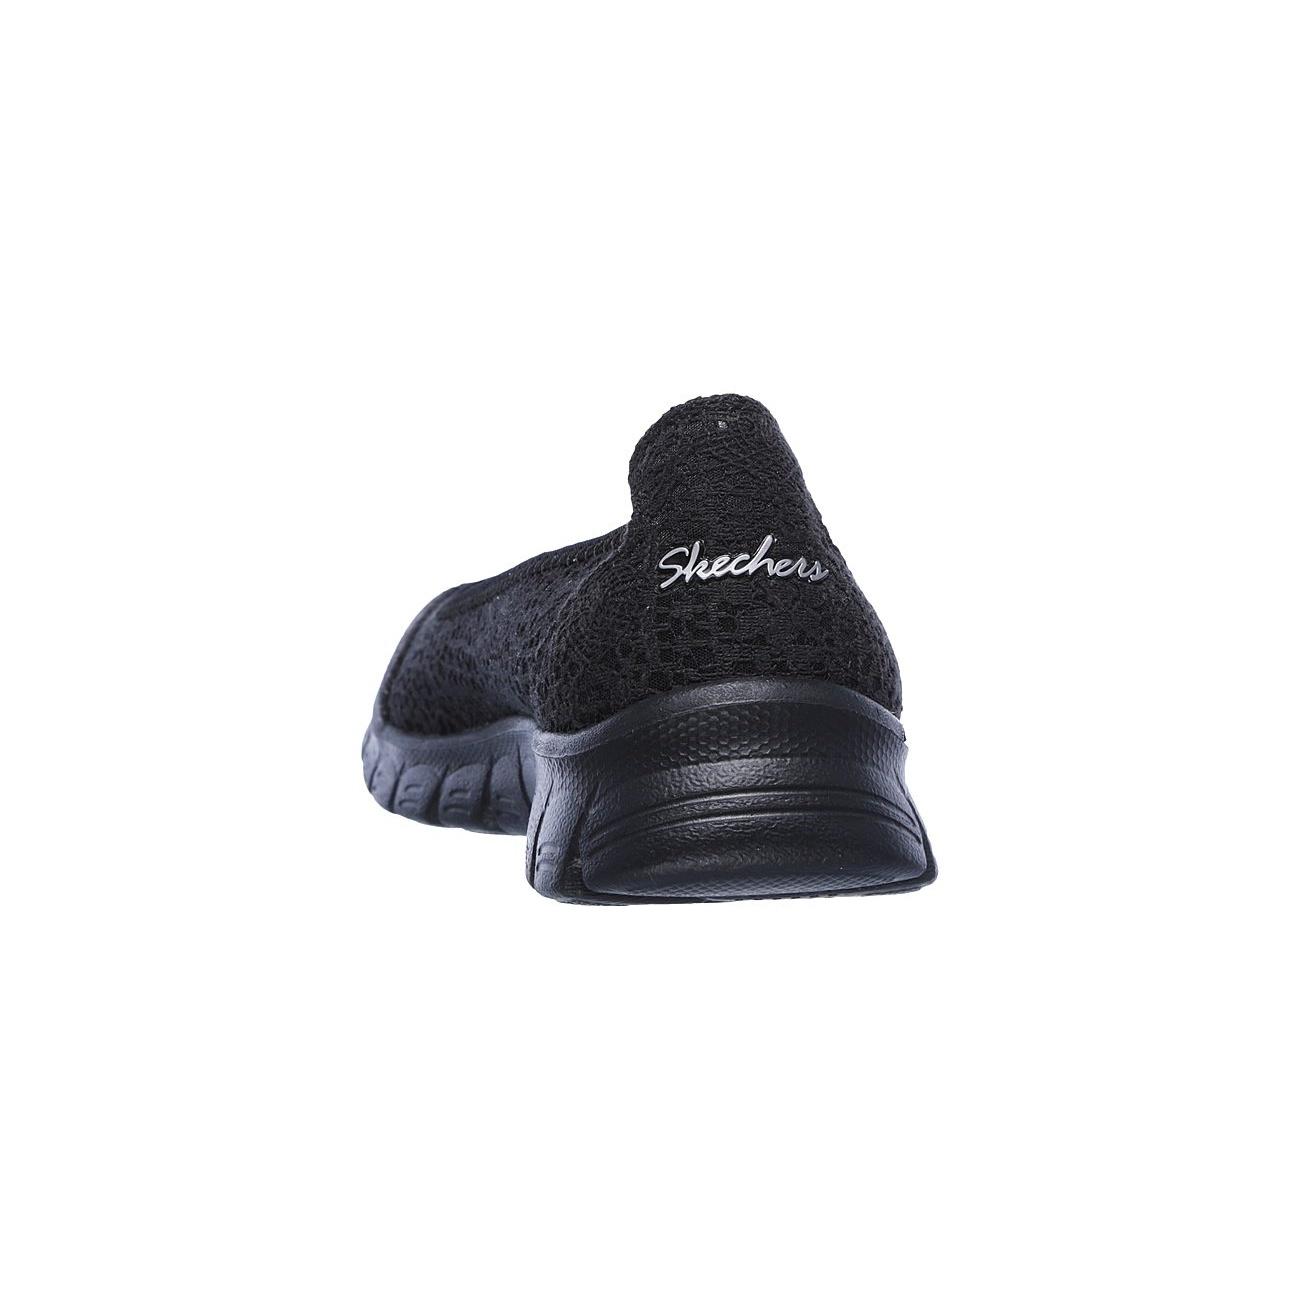 Skechers-Bailarinas-deportivas-de-verano-modelo-EZ-Flex-3-0-Beautify-FS5199 miniatura 12